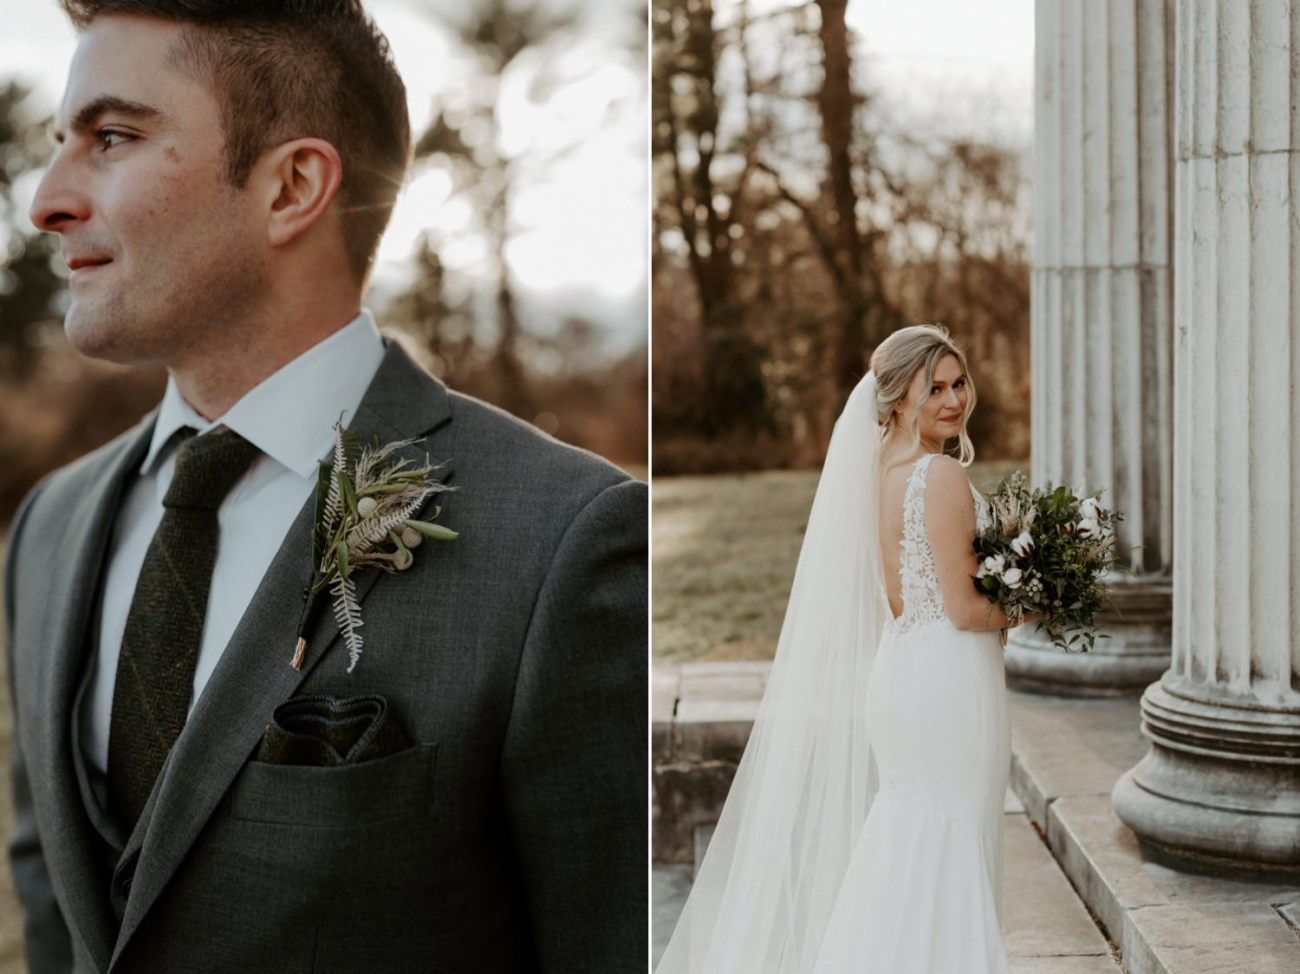 Princeton Battlefield Wedding Princeton University Elopement New Jersey Wedding Photographer Anais Possamai Photography 32